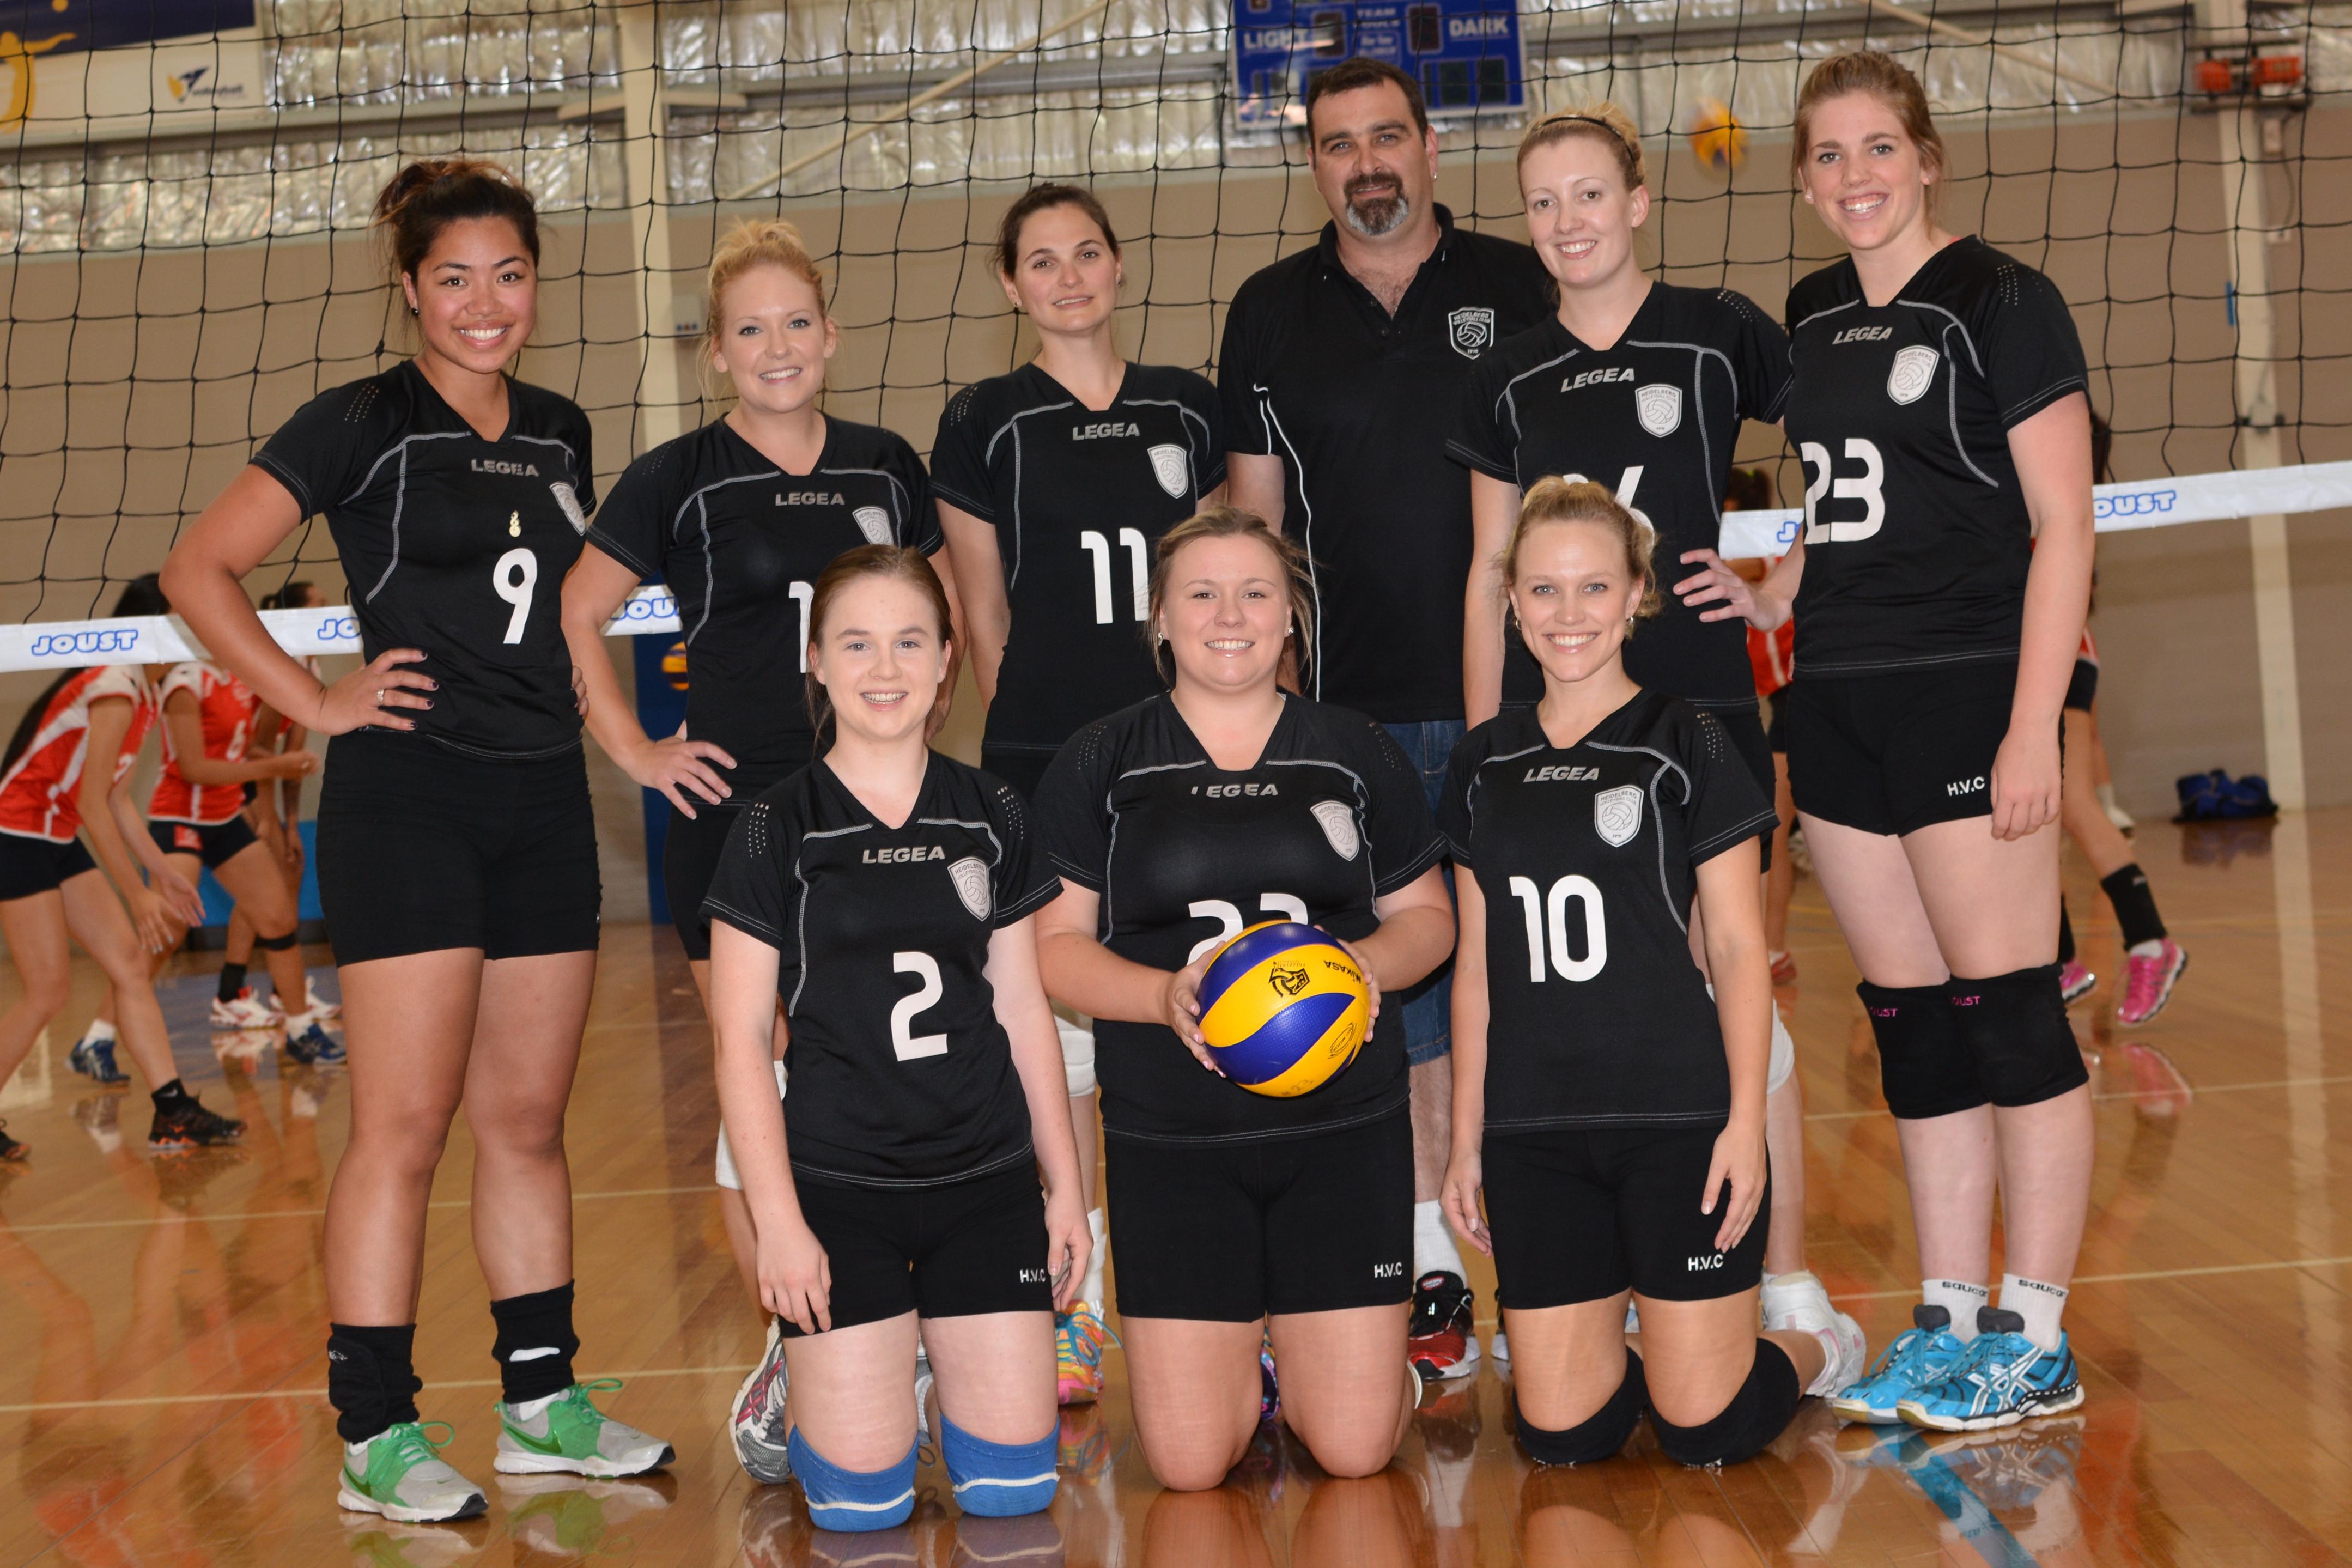 Heidelberg volleyball club